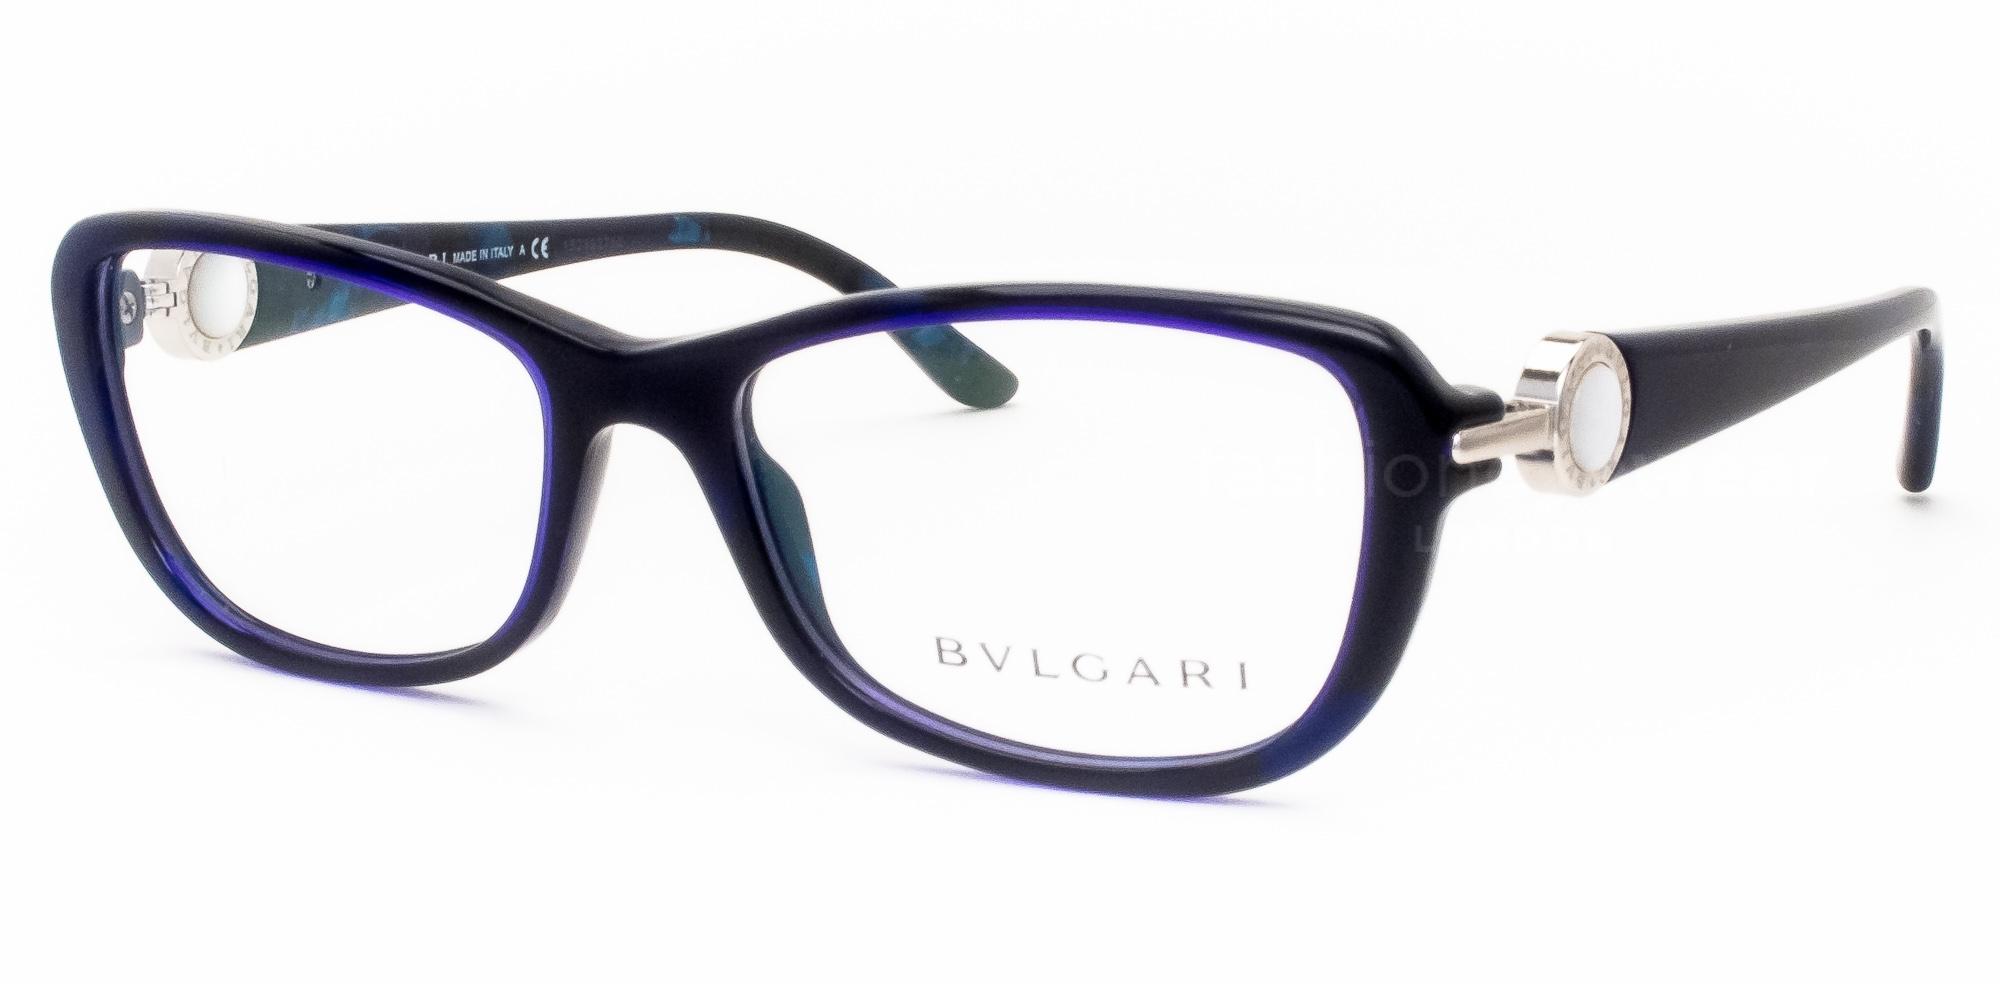 Bulgari Sunglasses amp Eyeglasses  LensCrafters  Bulgari